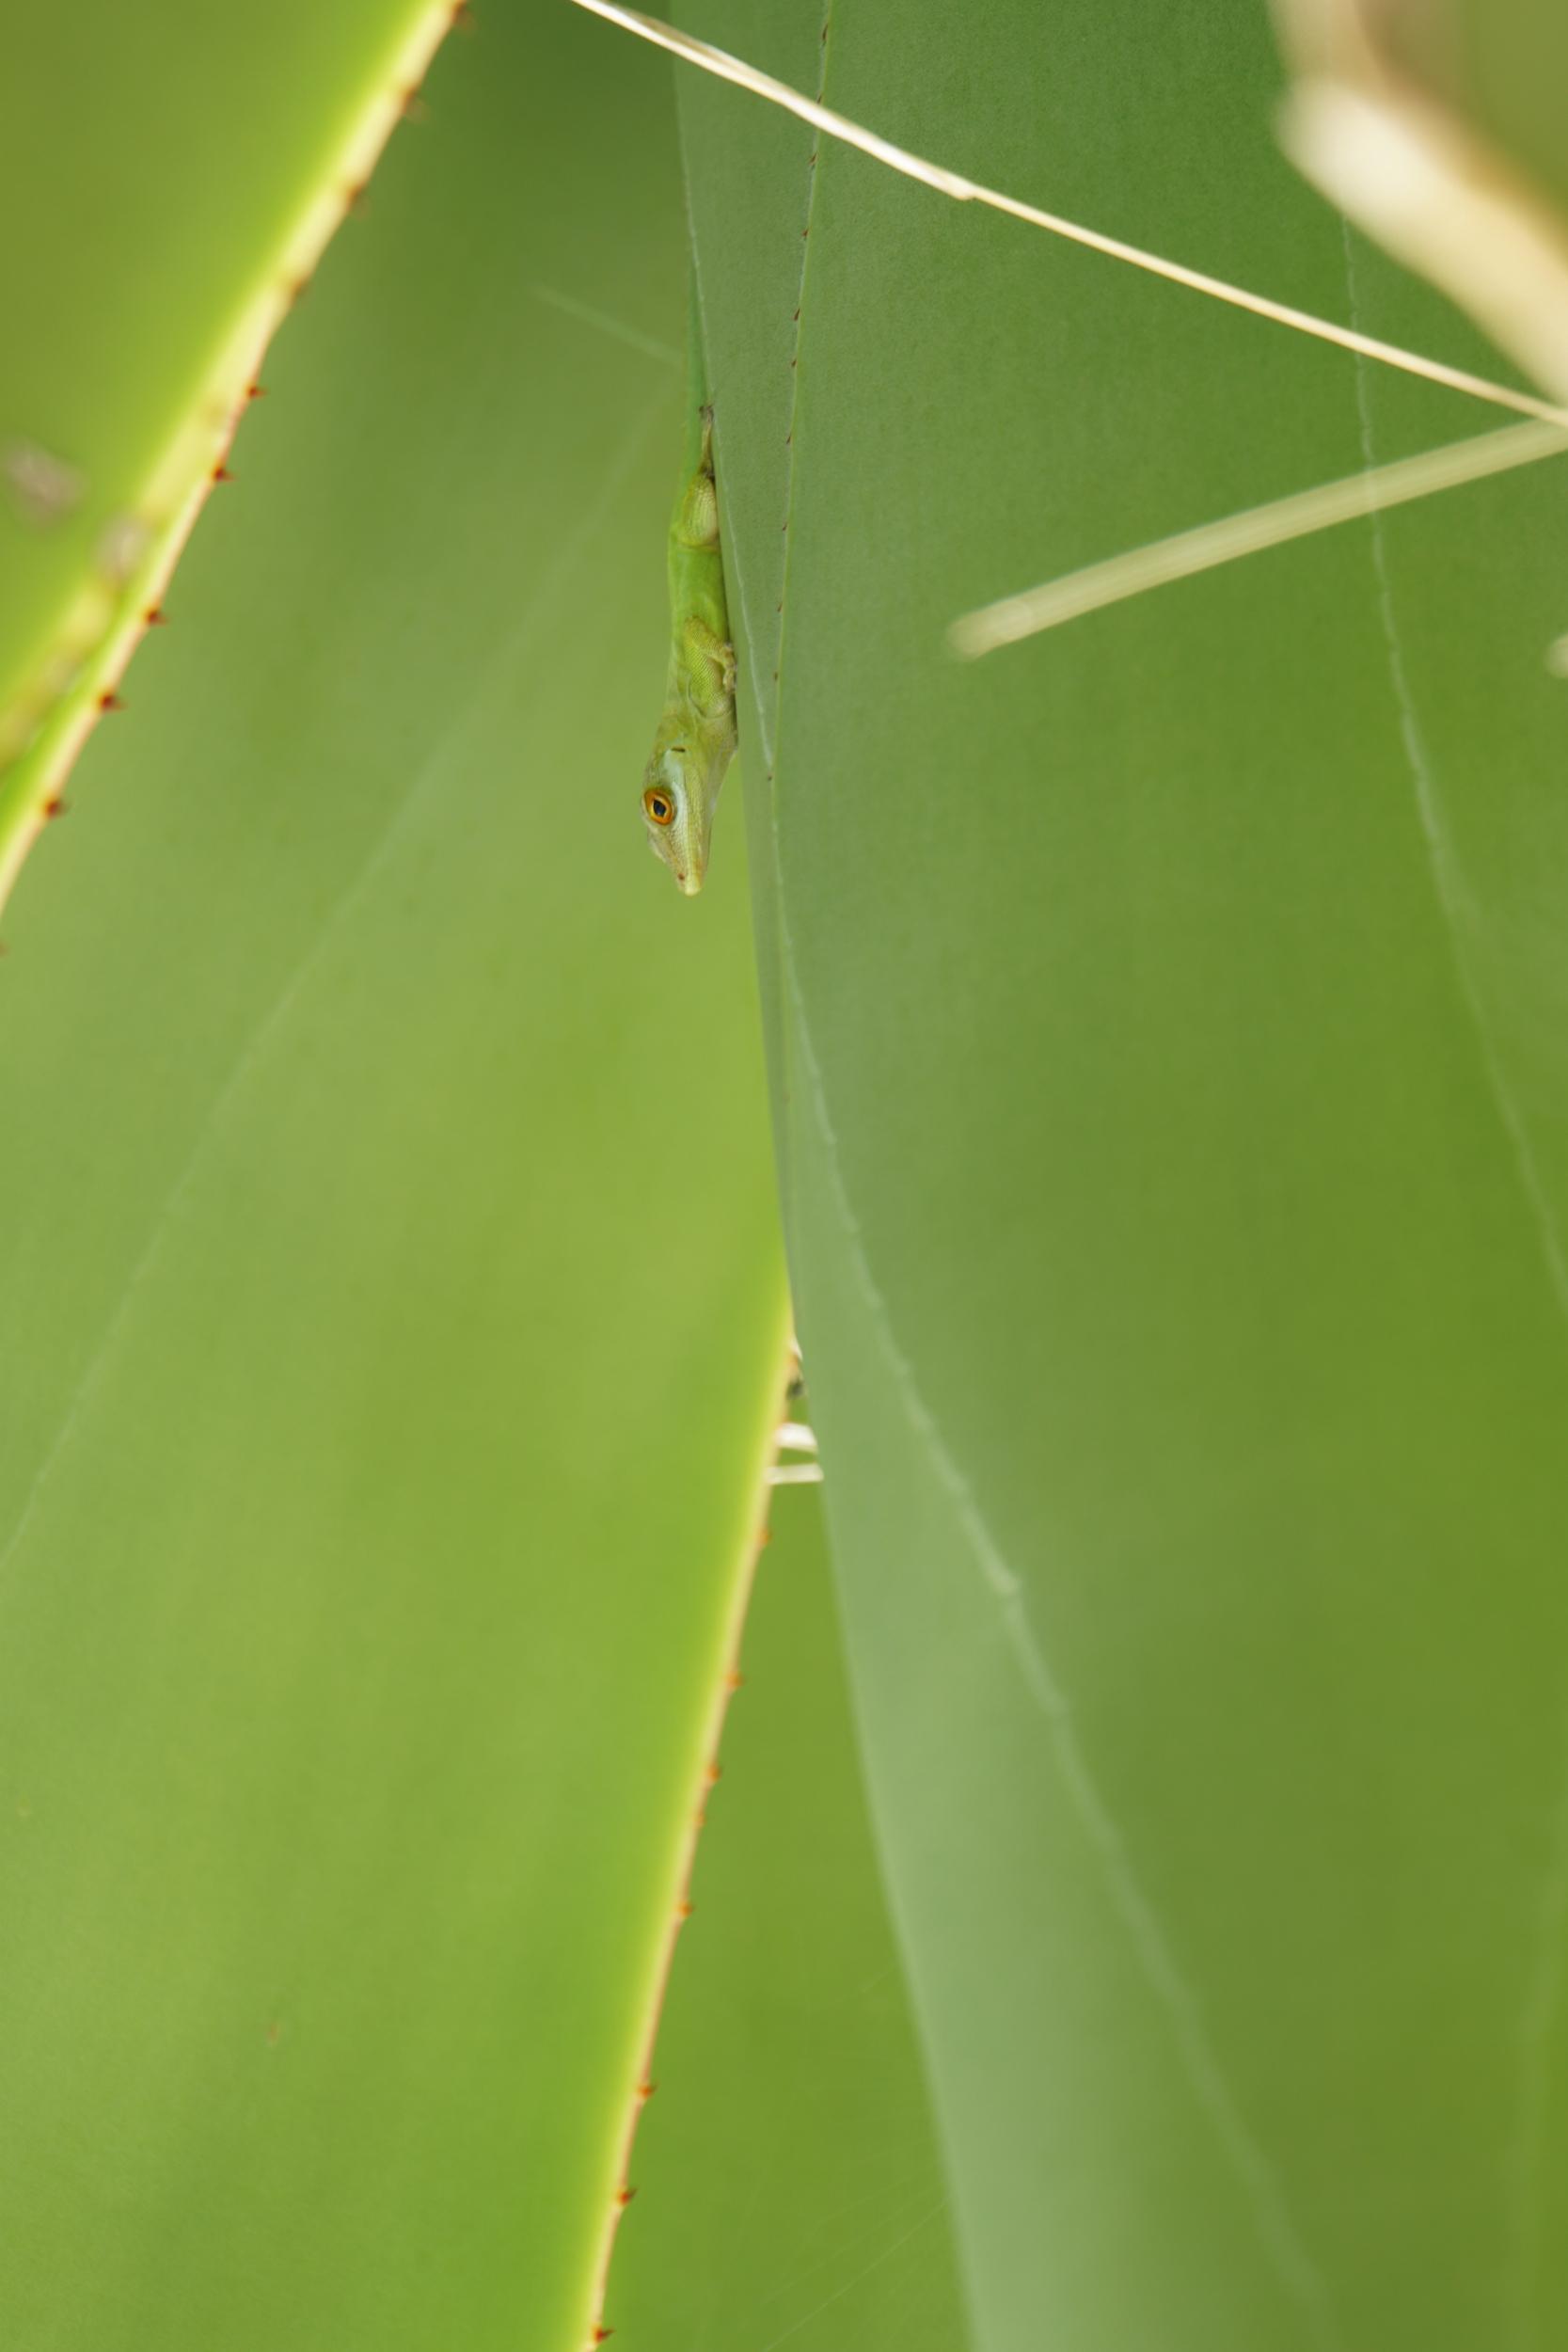 12. Lizard hiding...